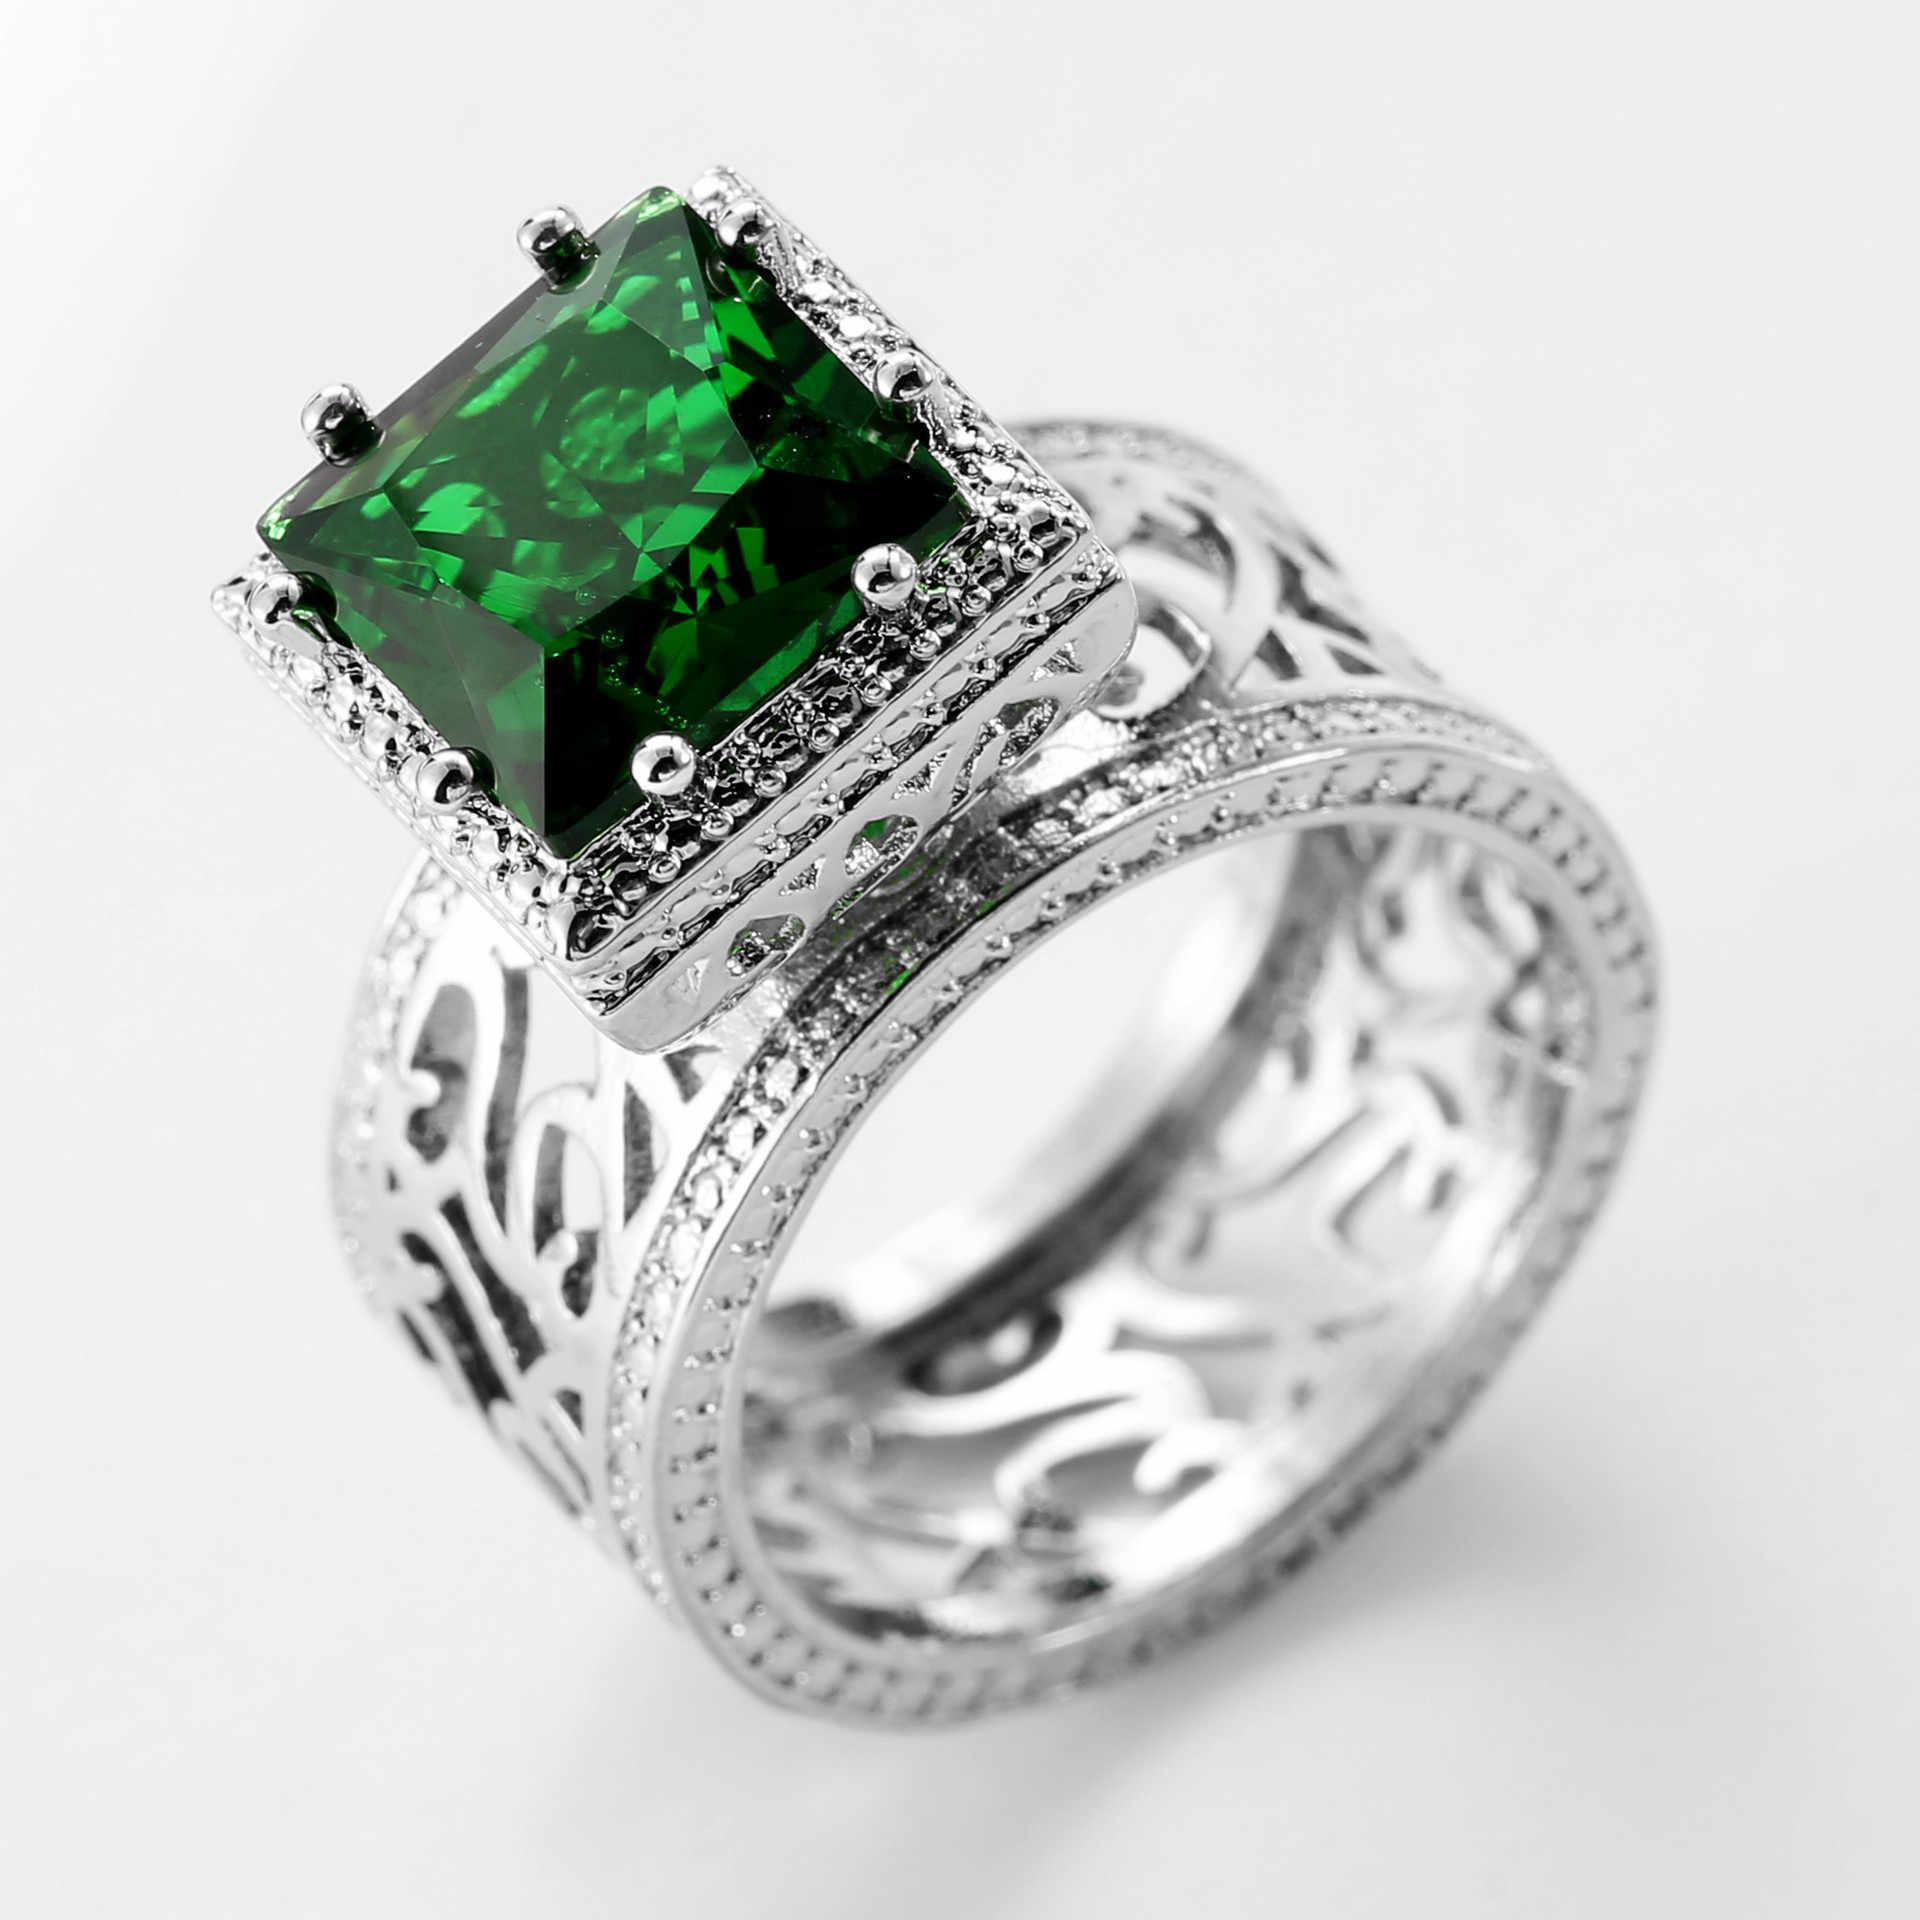 Anillo de compromiso de circonita cúbica con corte de princesa verde plateado de anillos 925 para mujer, boda, gran regalo de fiesta